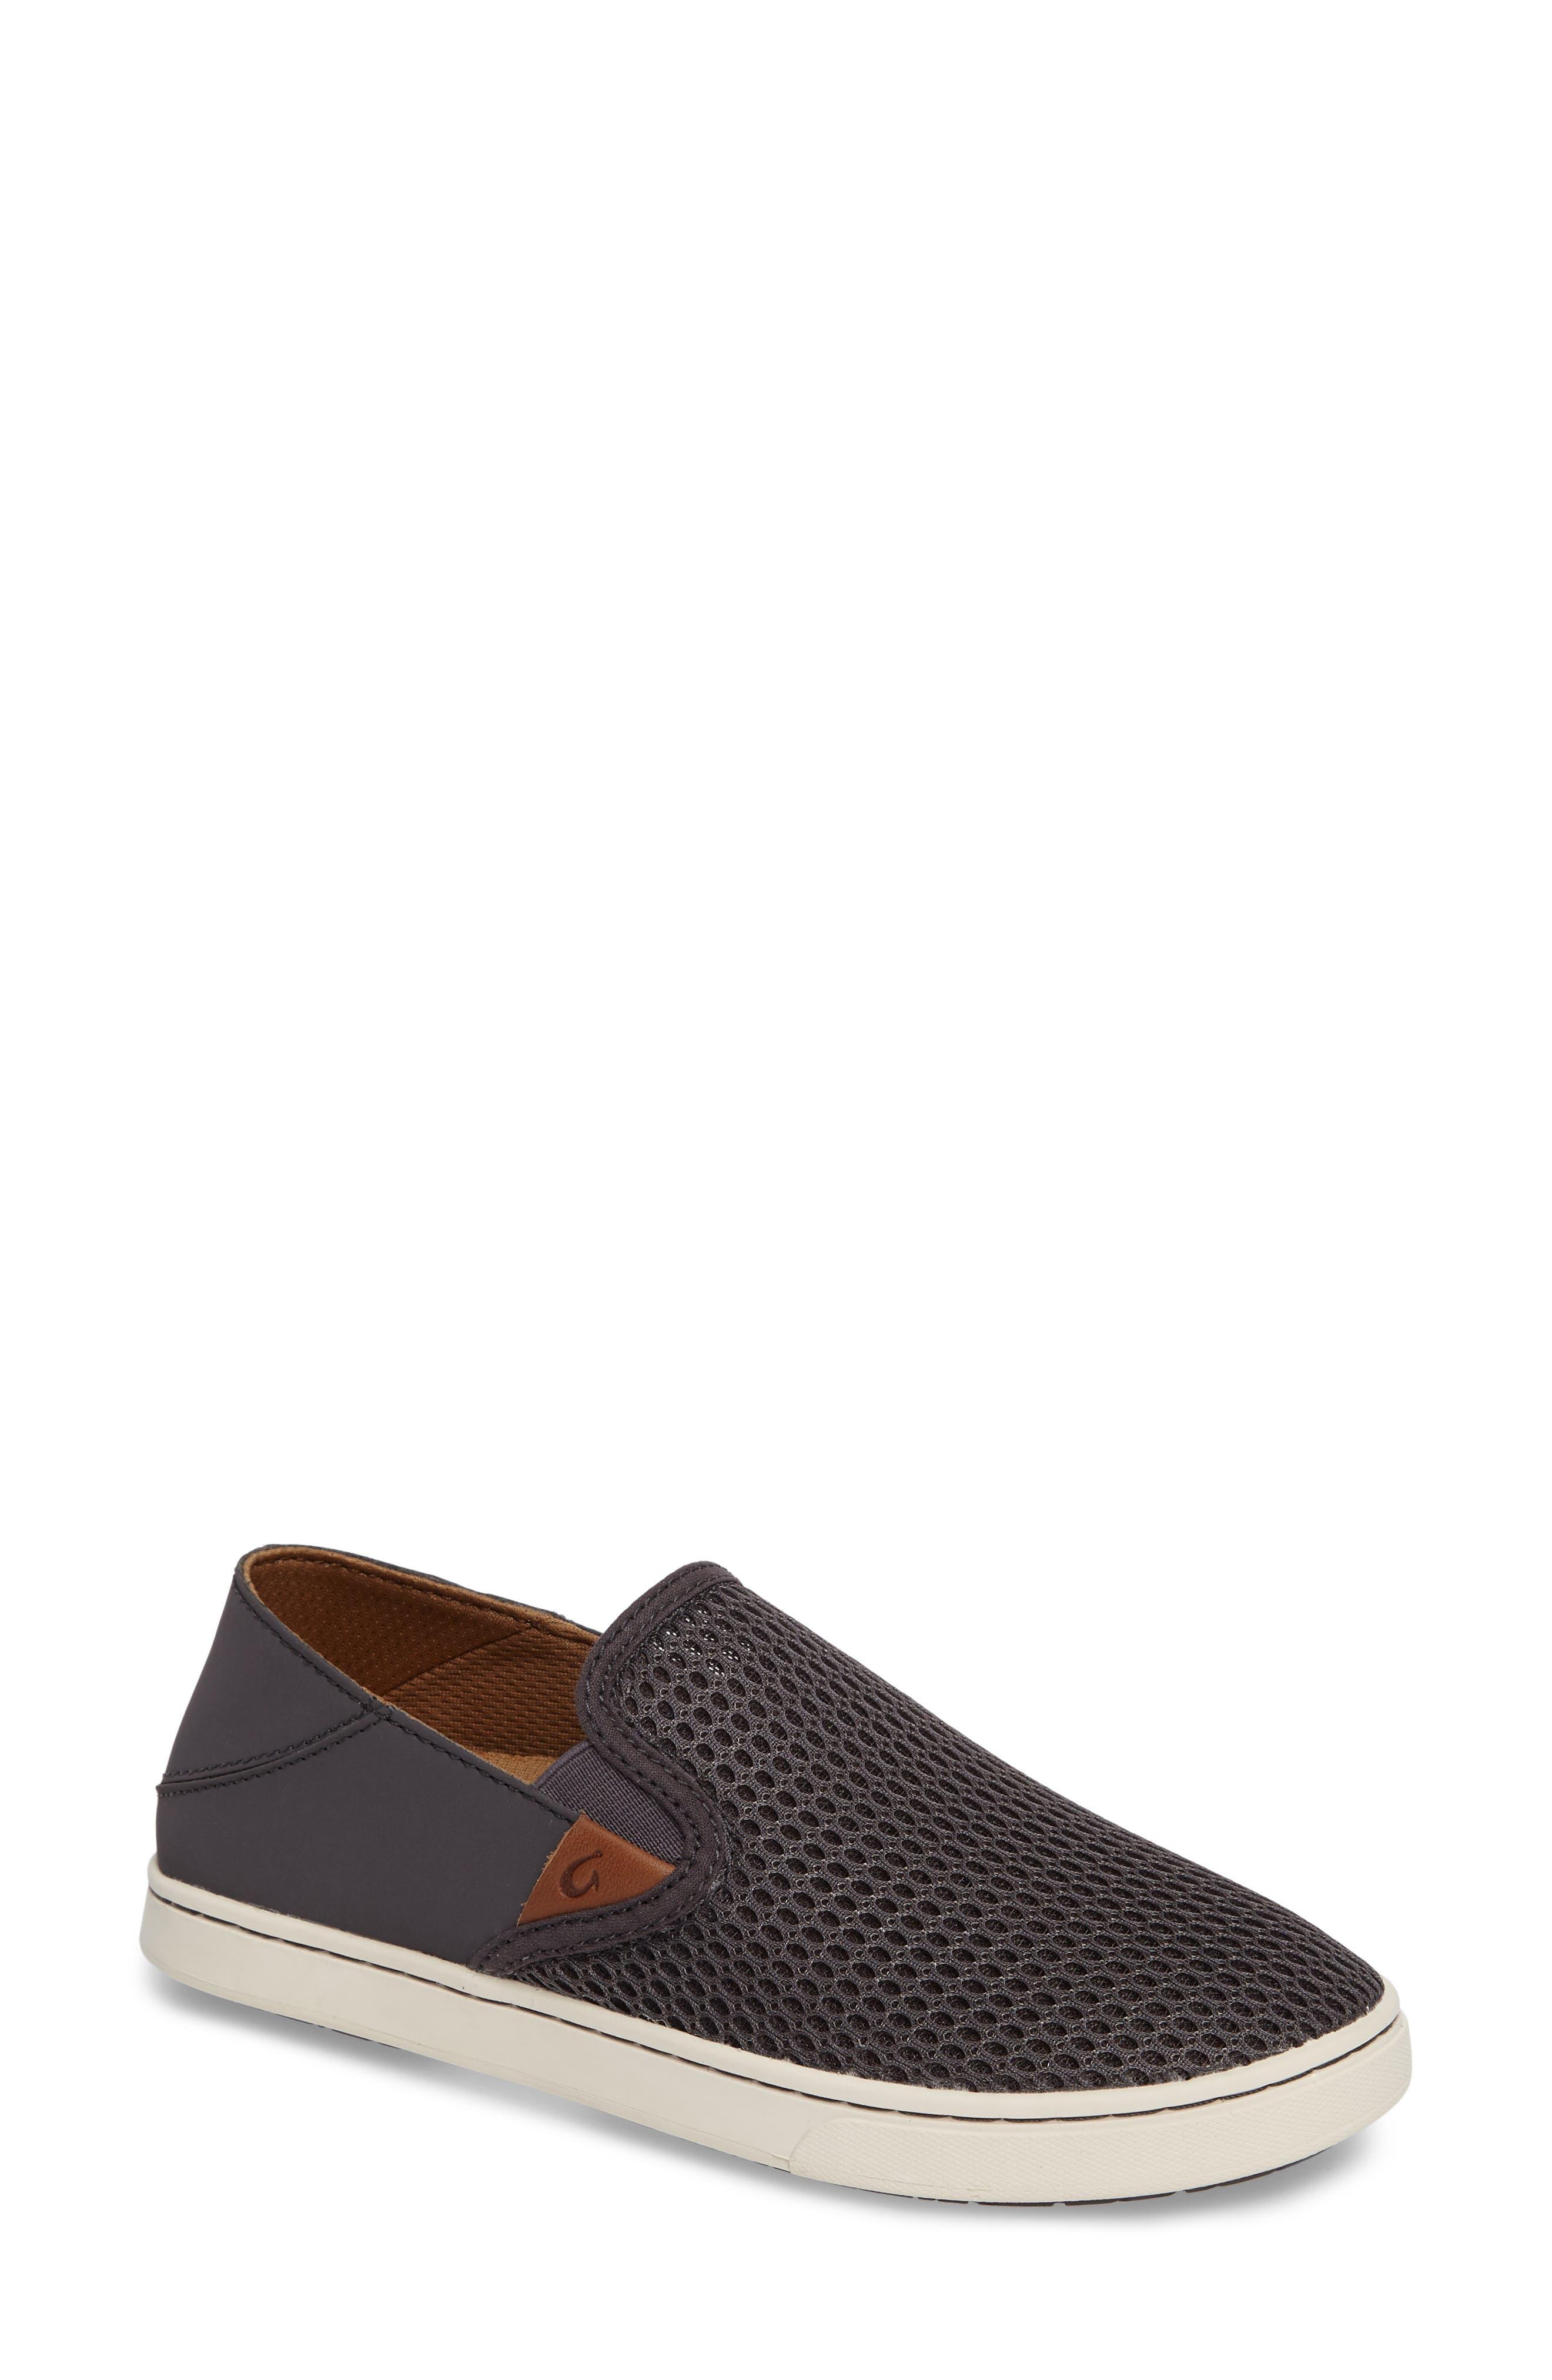 'Pehuea' Slip-On Sneaker,                         Main,                         color, PAVEMENT/ PAVEMENT FABRIC